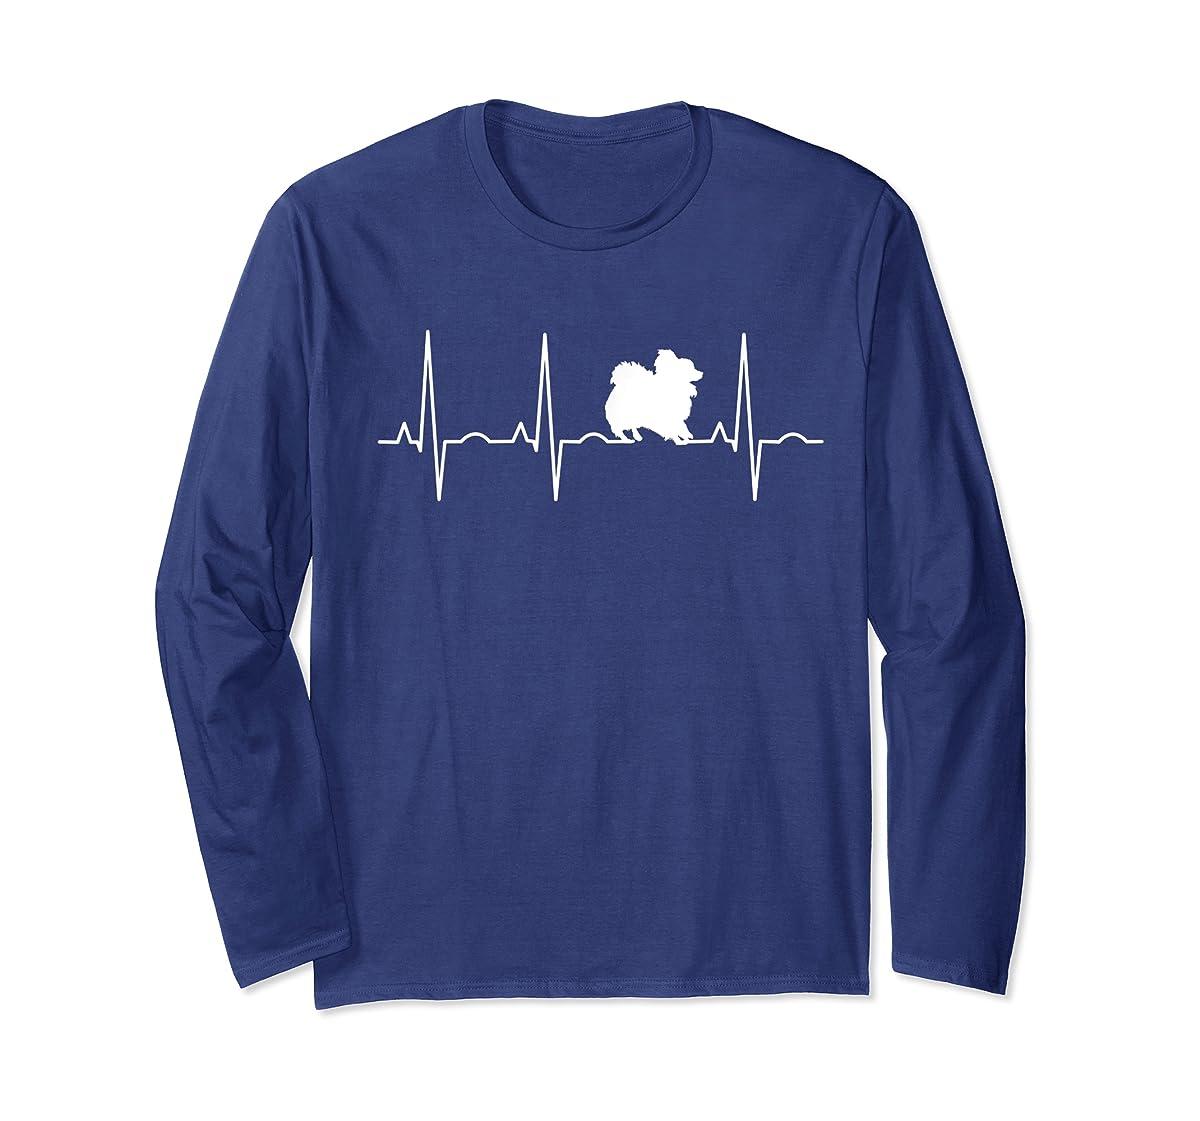 Pomeranian Heartbeat T-Shirt Pom Shirt Gifts Dog Lover-Long Sleeve-Navy